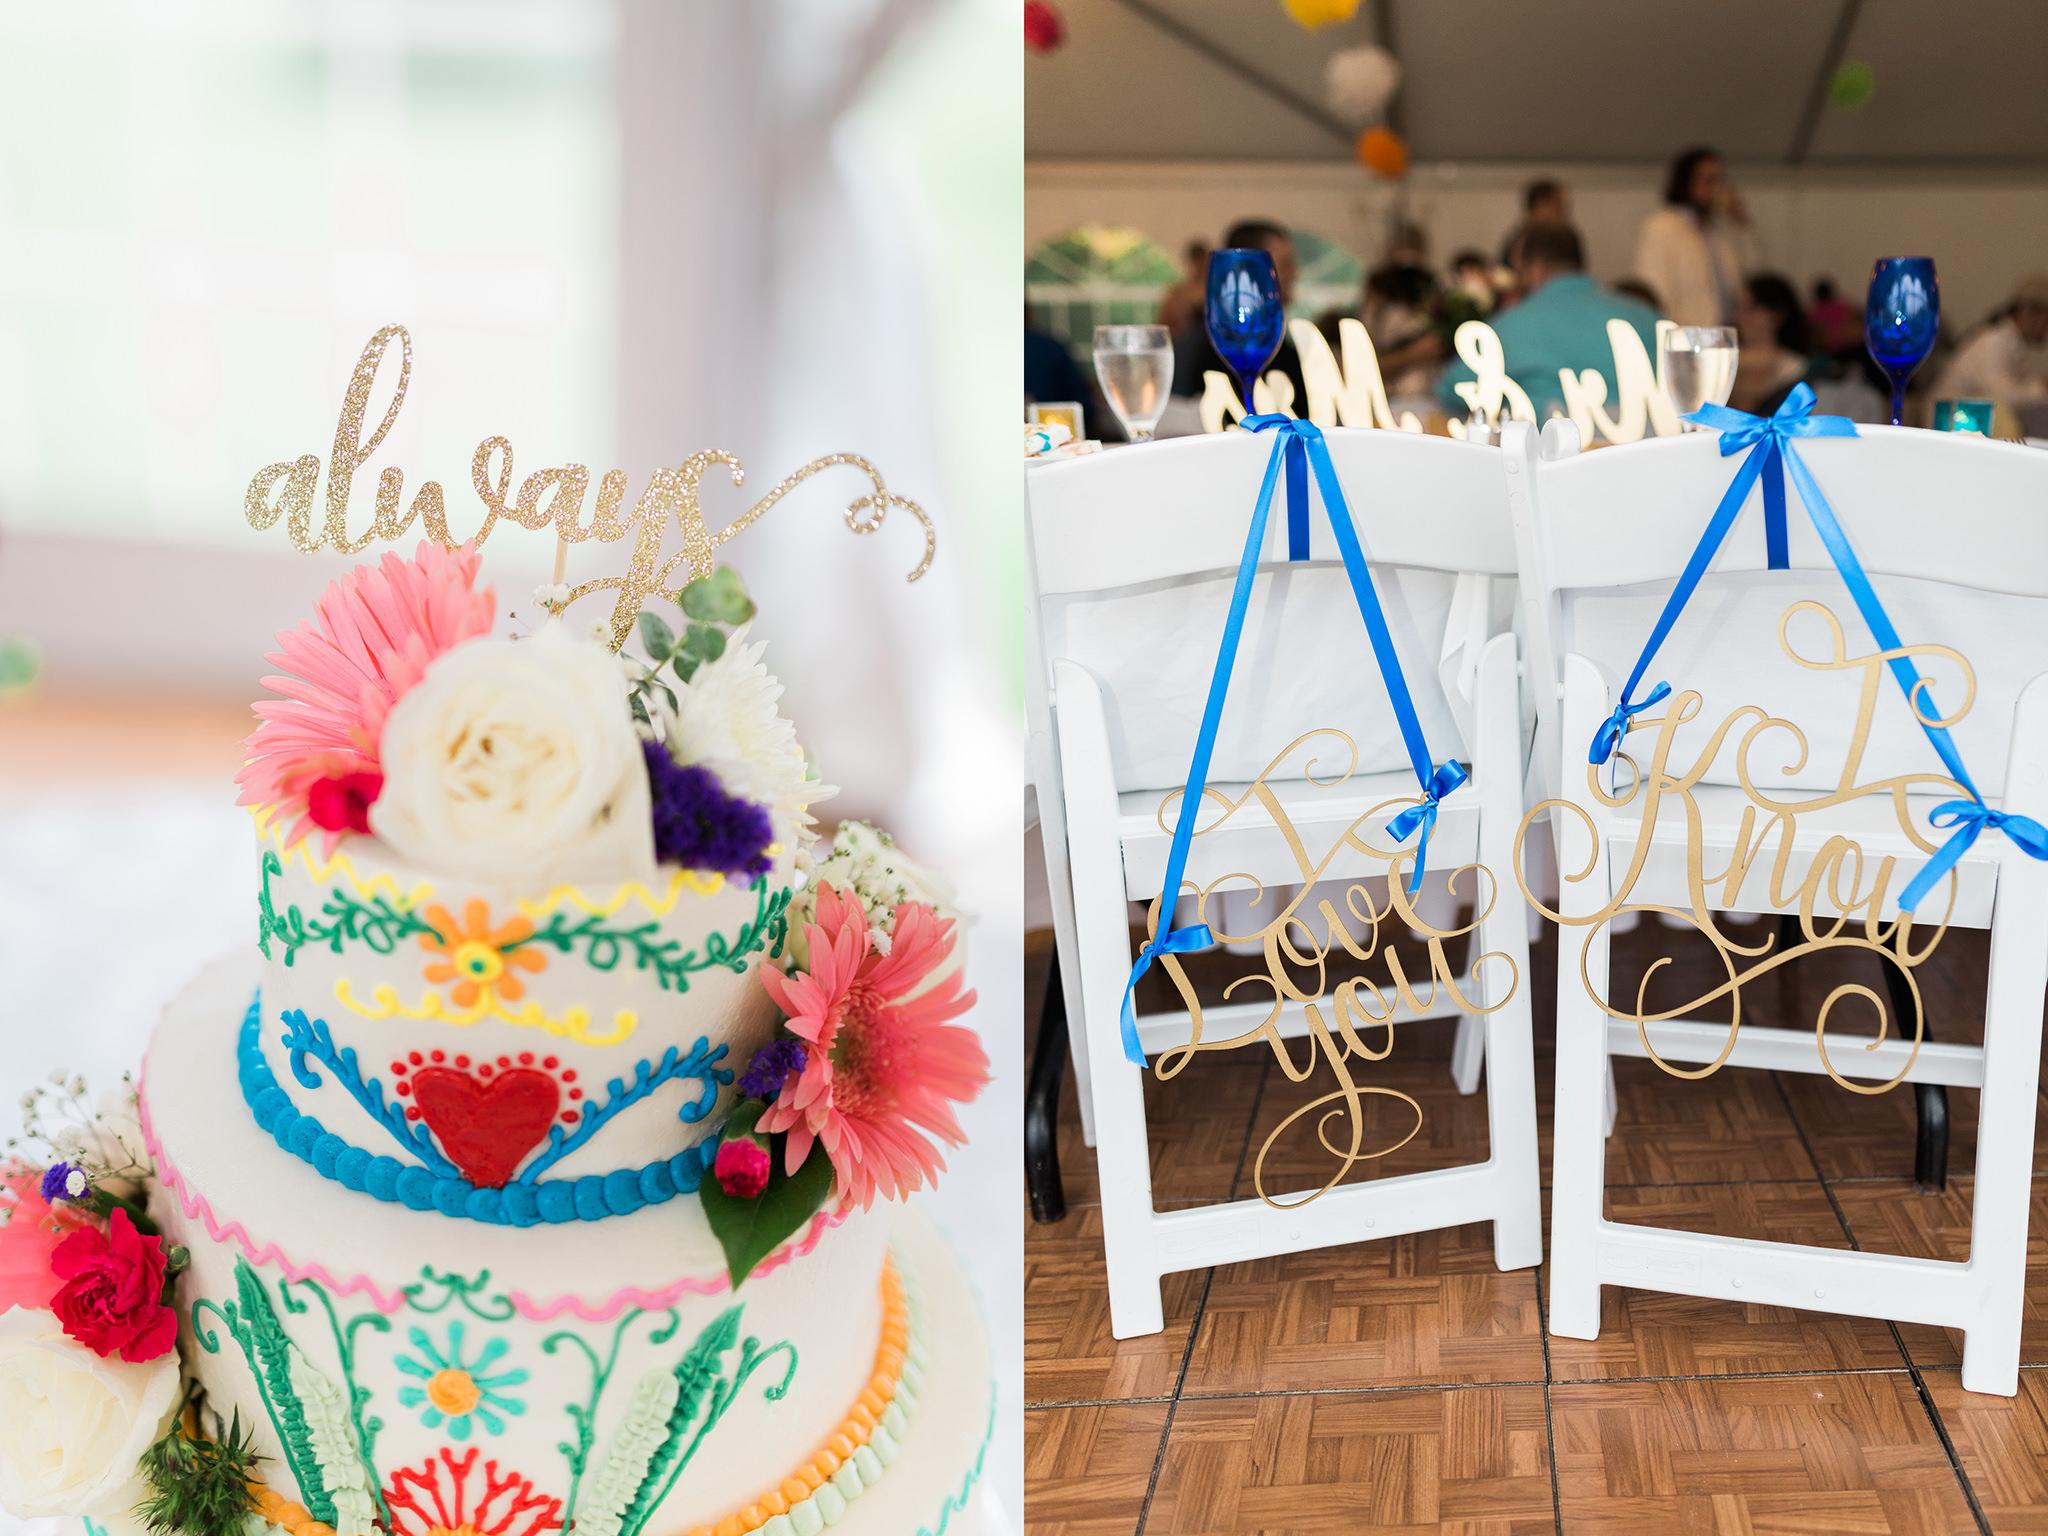 Mackinac Island Wedding, Traverse City wedding photographer Rockhill Studio, Inn at Stonecliffe, wedding cake and decor